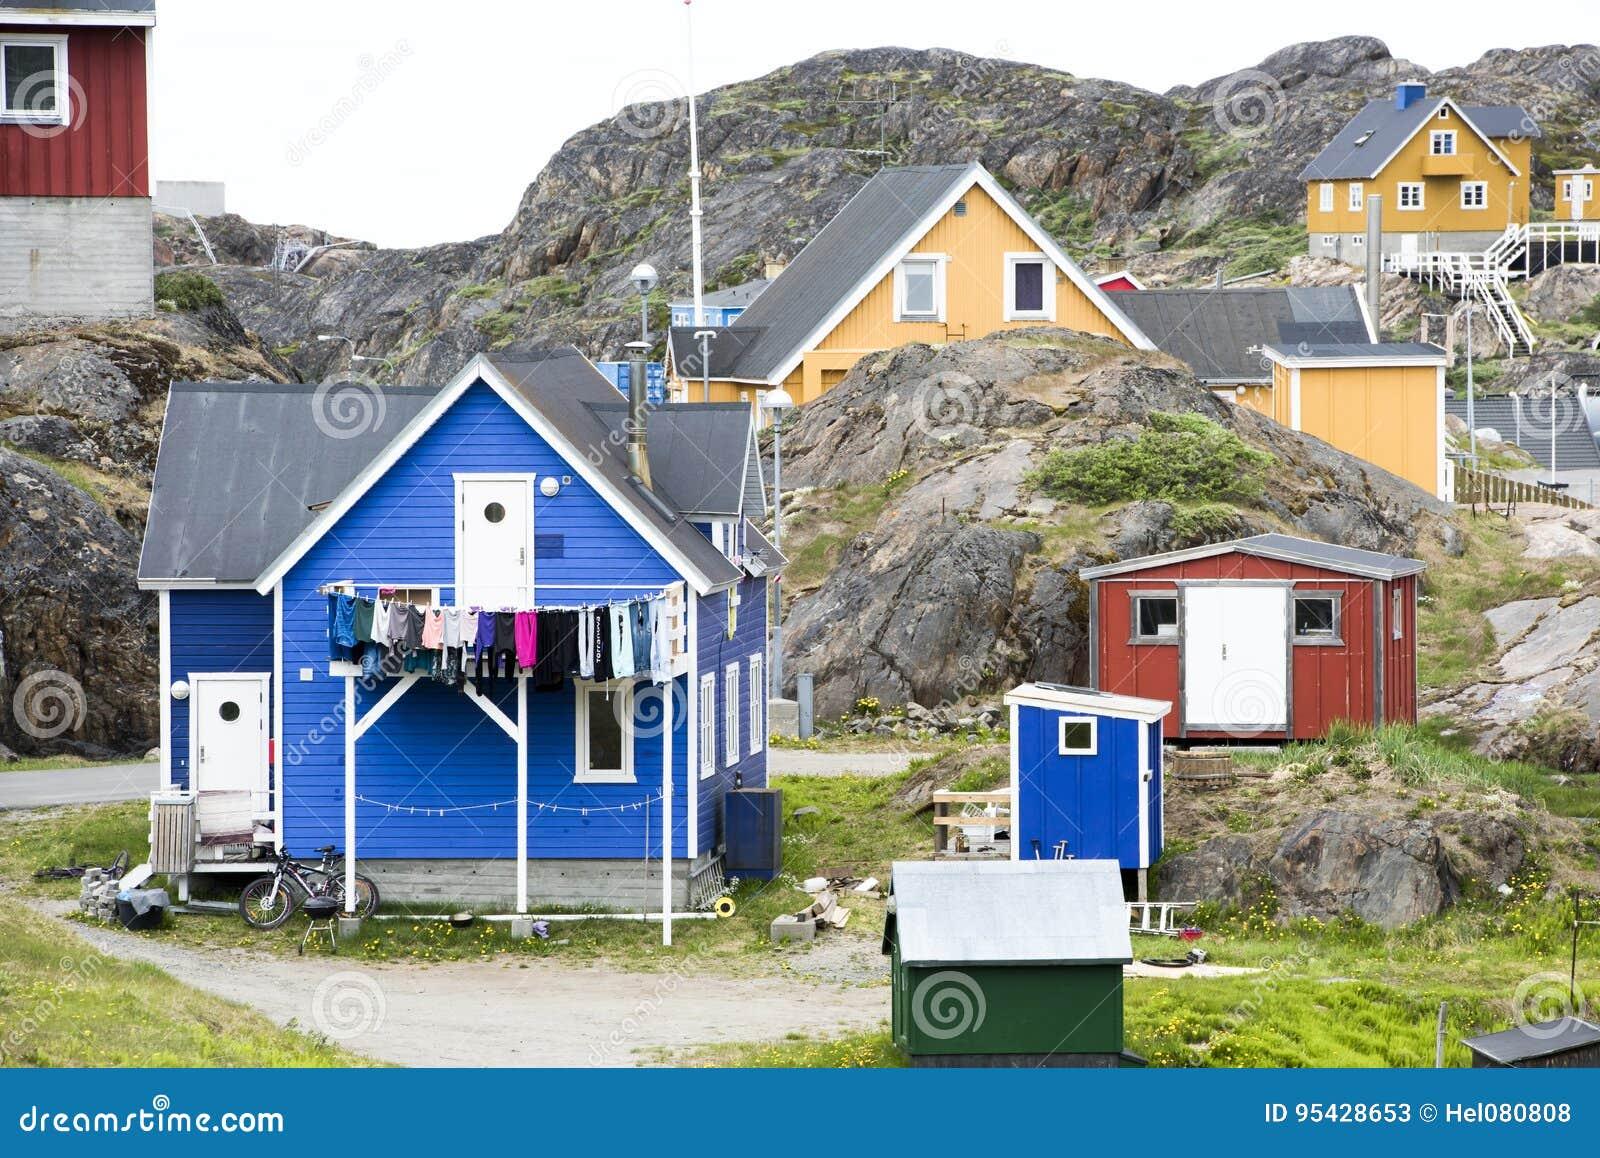 Greenlandic σπίτια μεταξύ των βράχων, Sisimiut